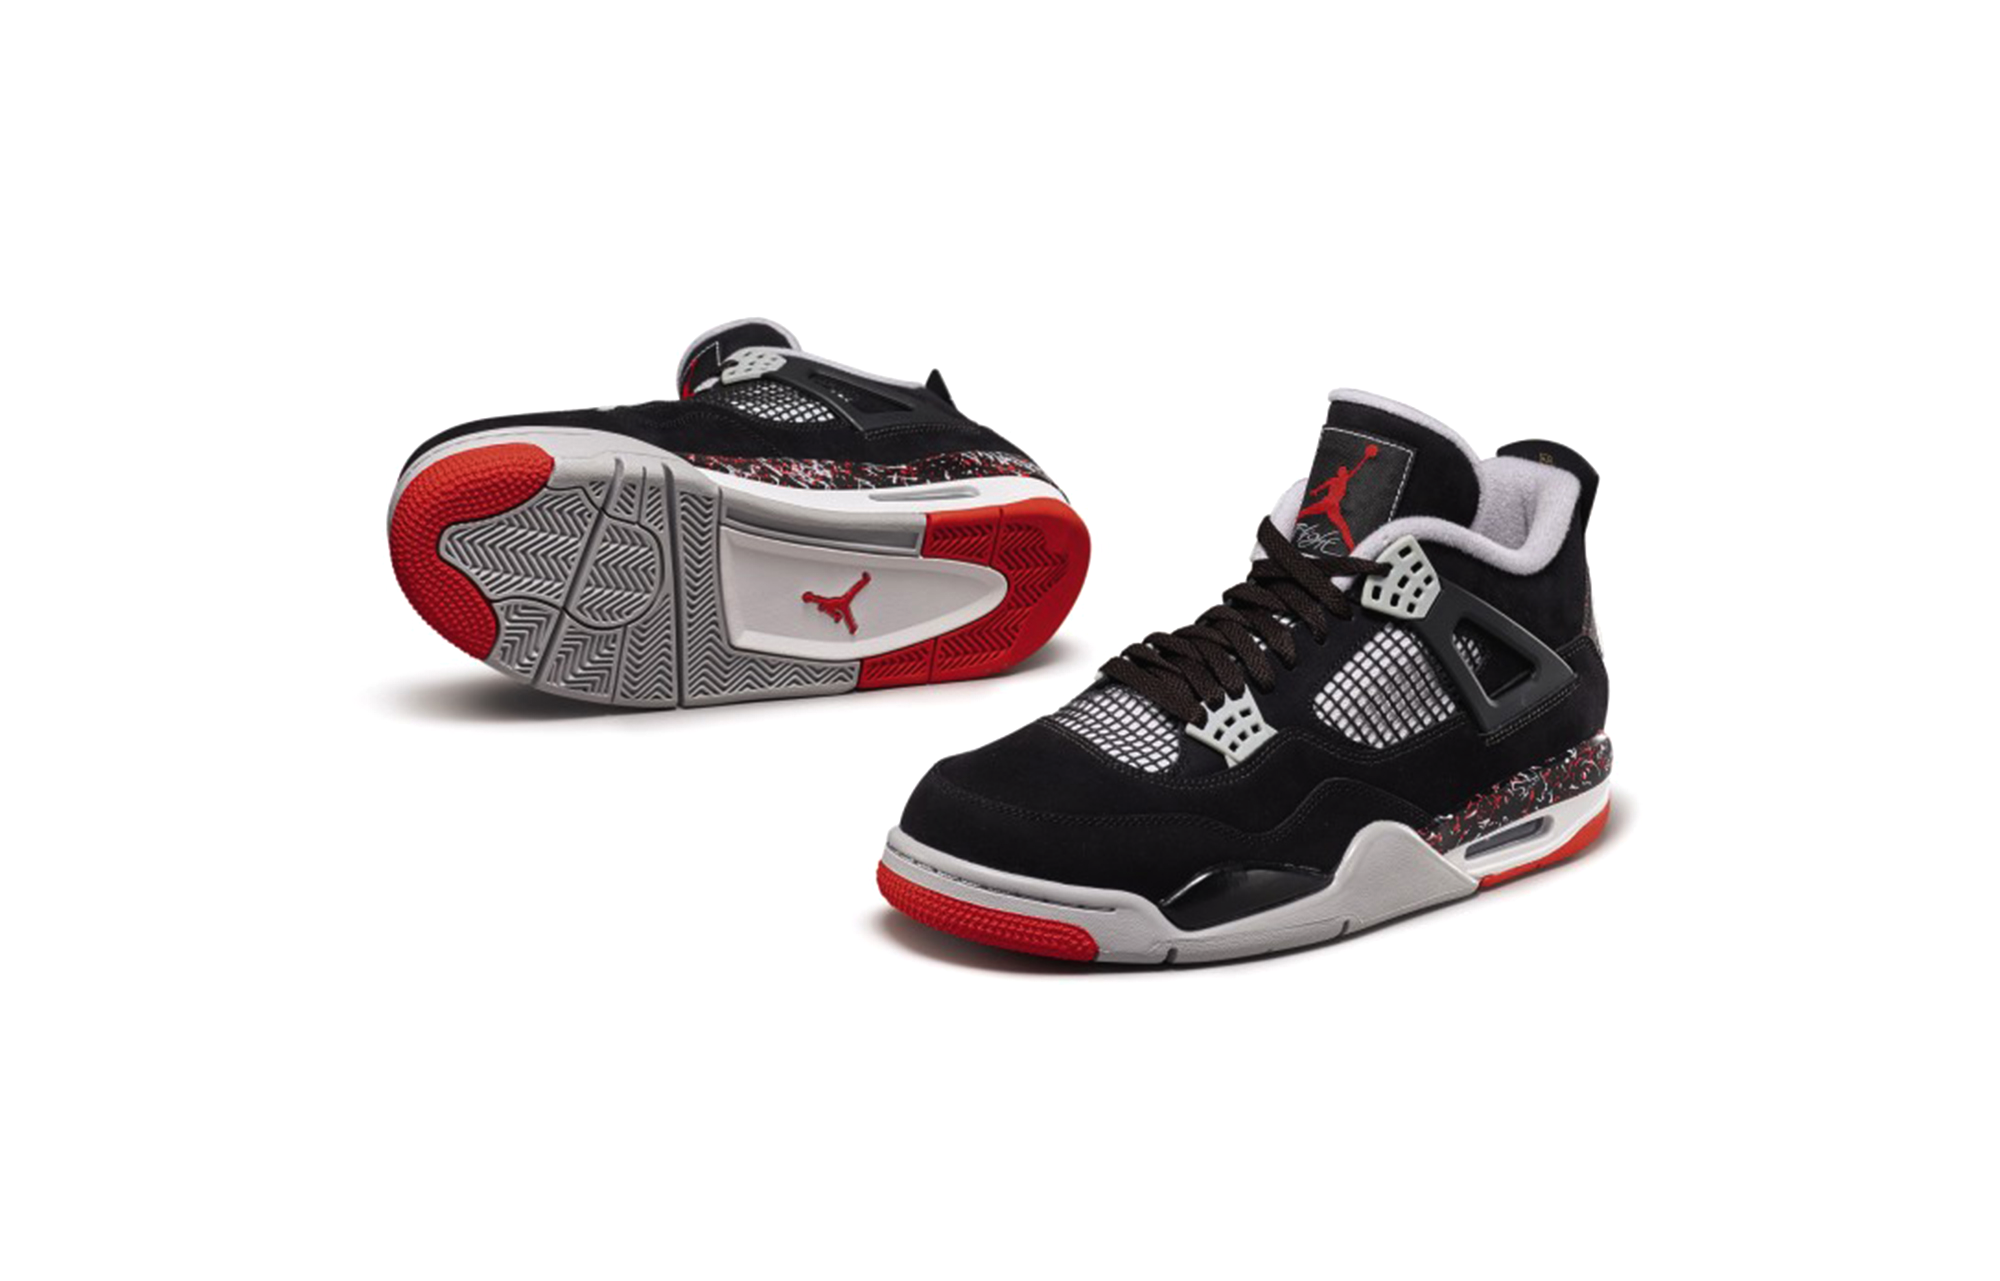 Невыпущенные кроссовки Drake Air Jordan IV Retro - хип-хоп-аукцион Sotheby's